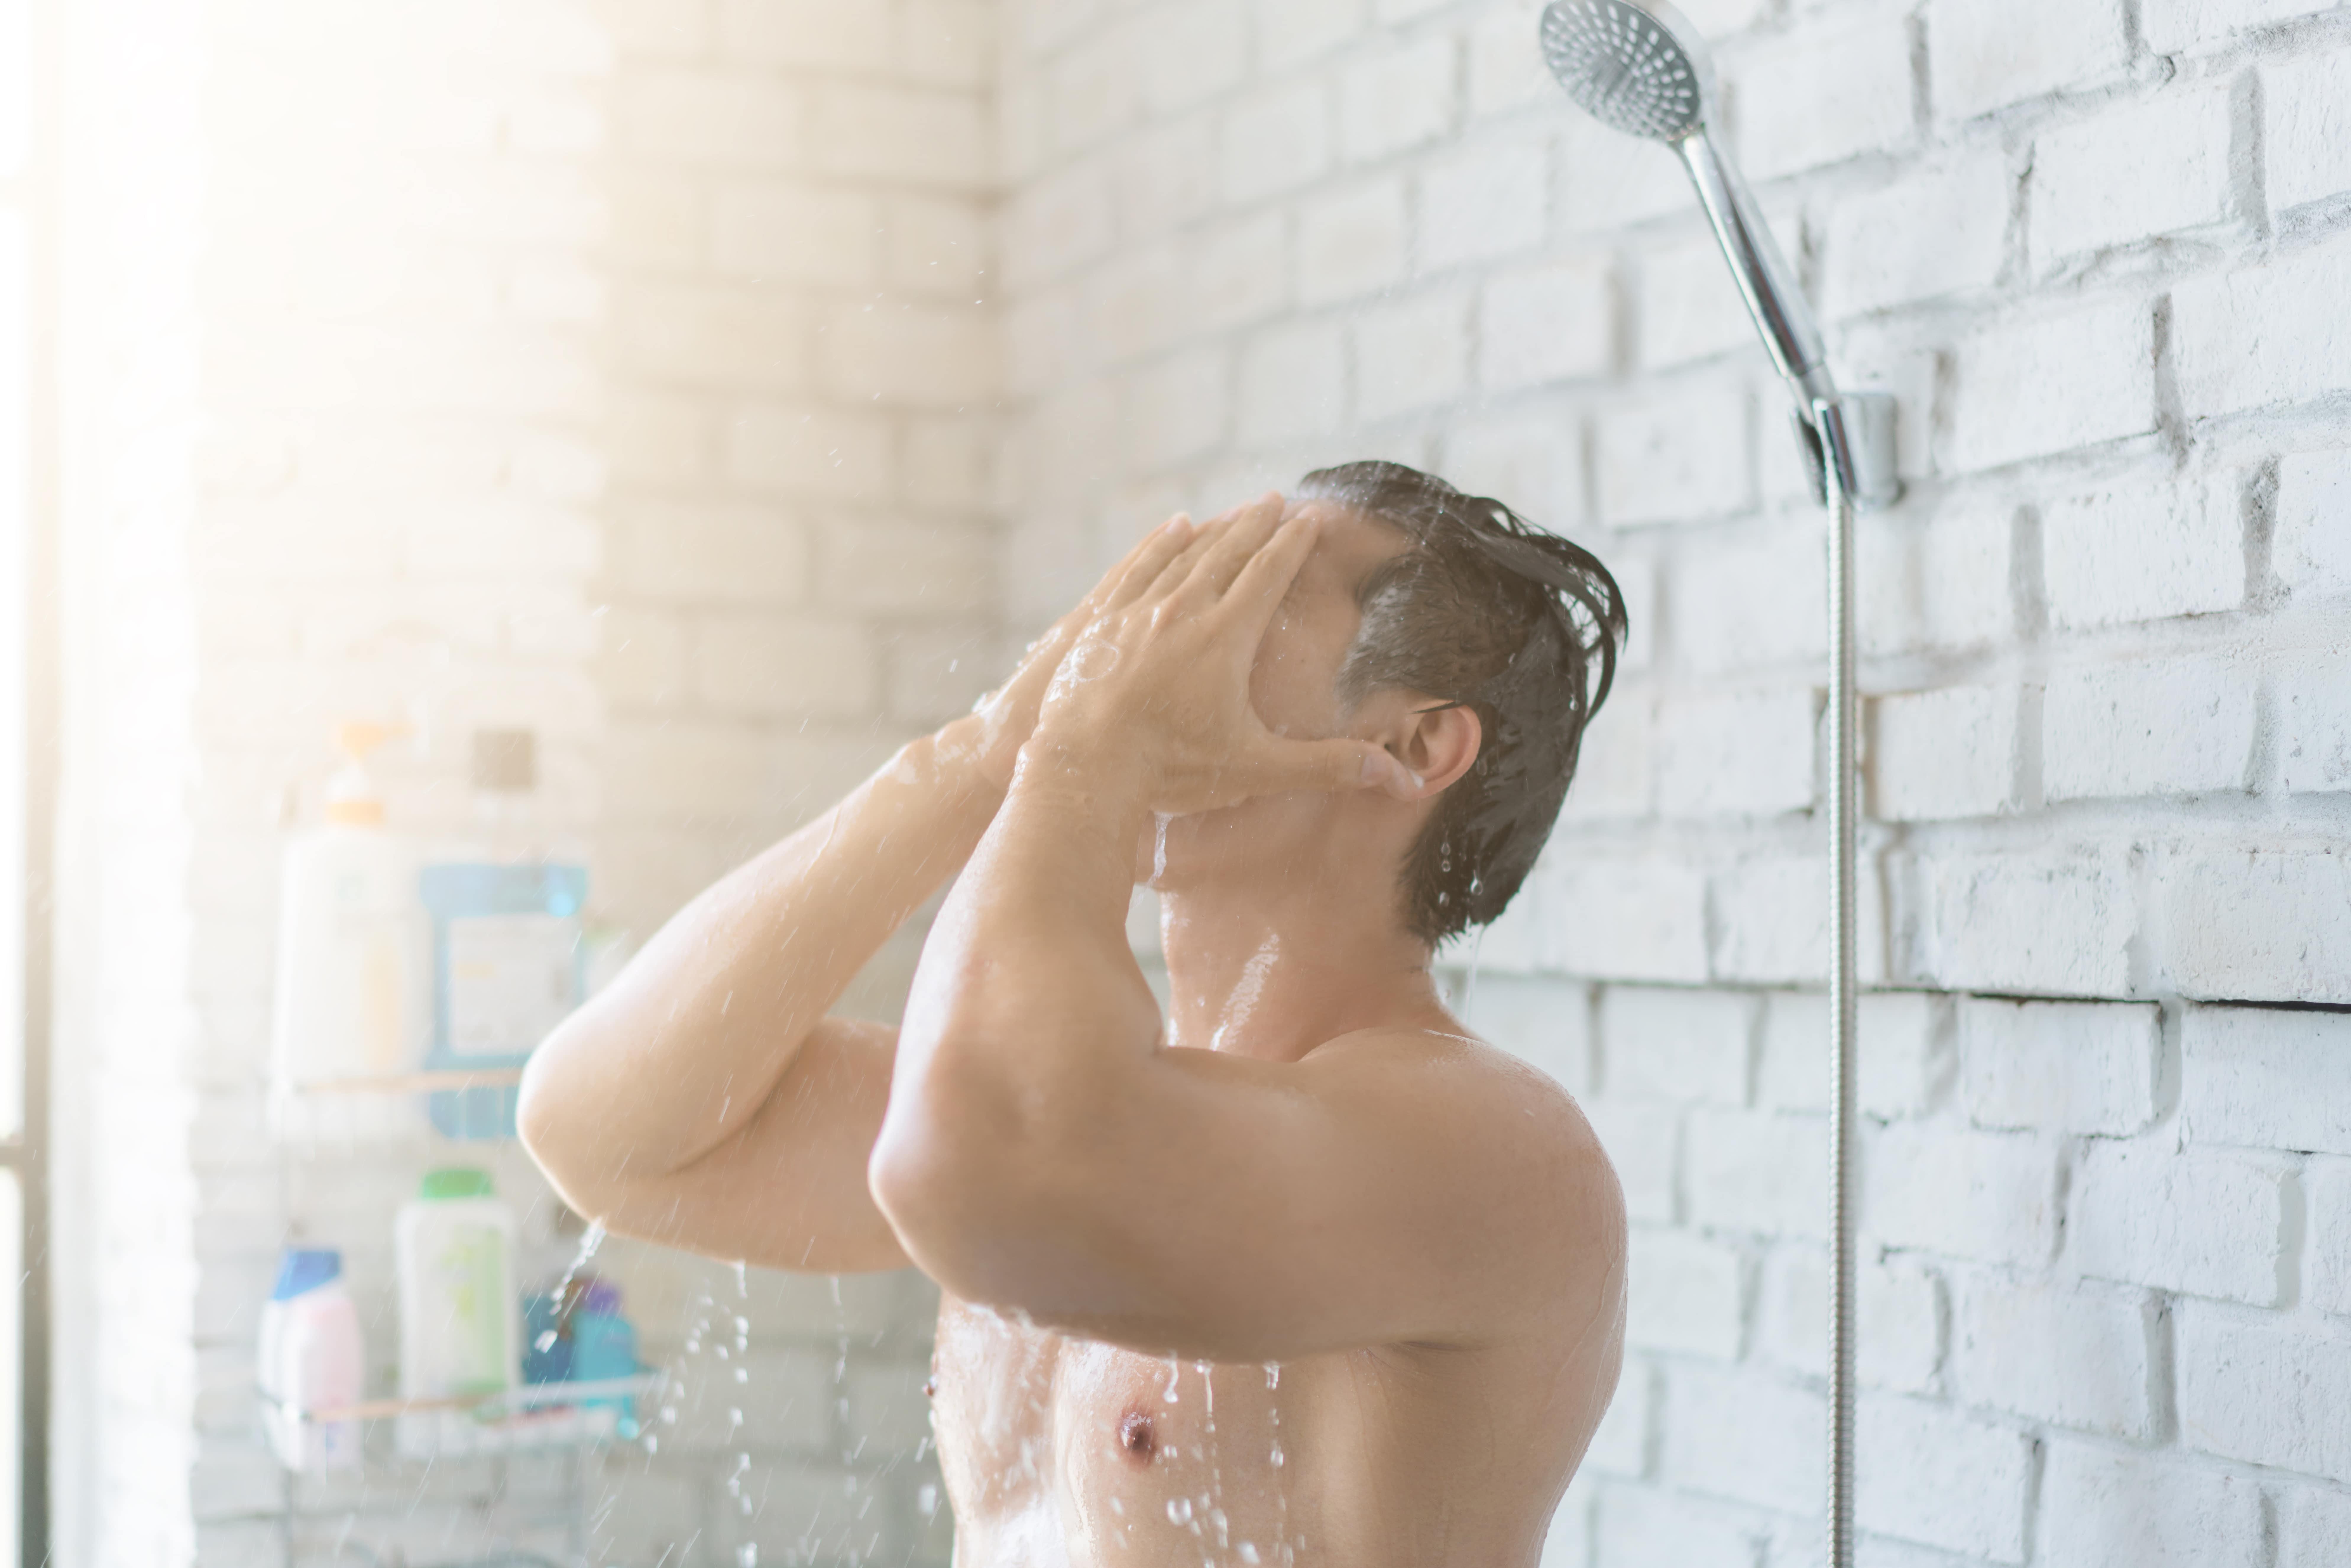 man applying conditioner in shower